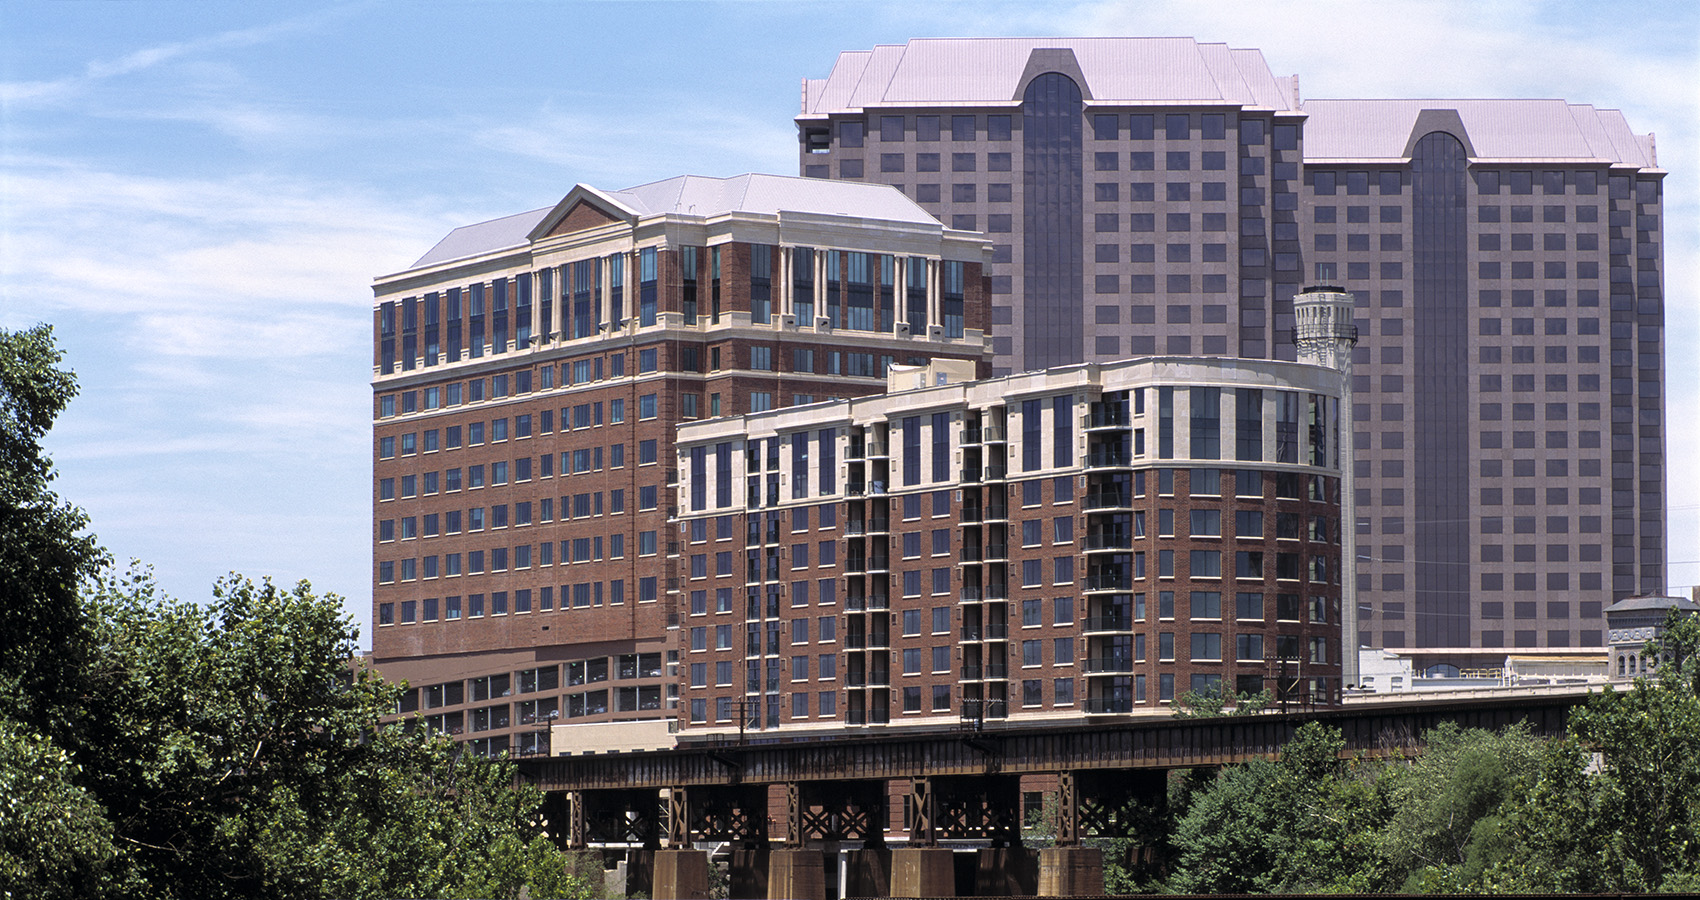 Daniel Corporation - Riverside on the James